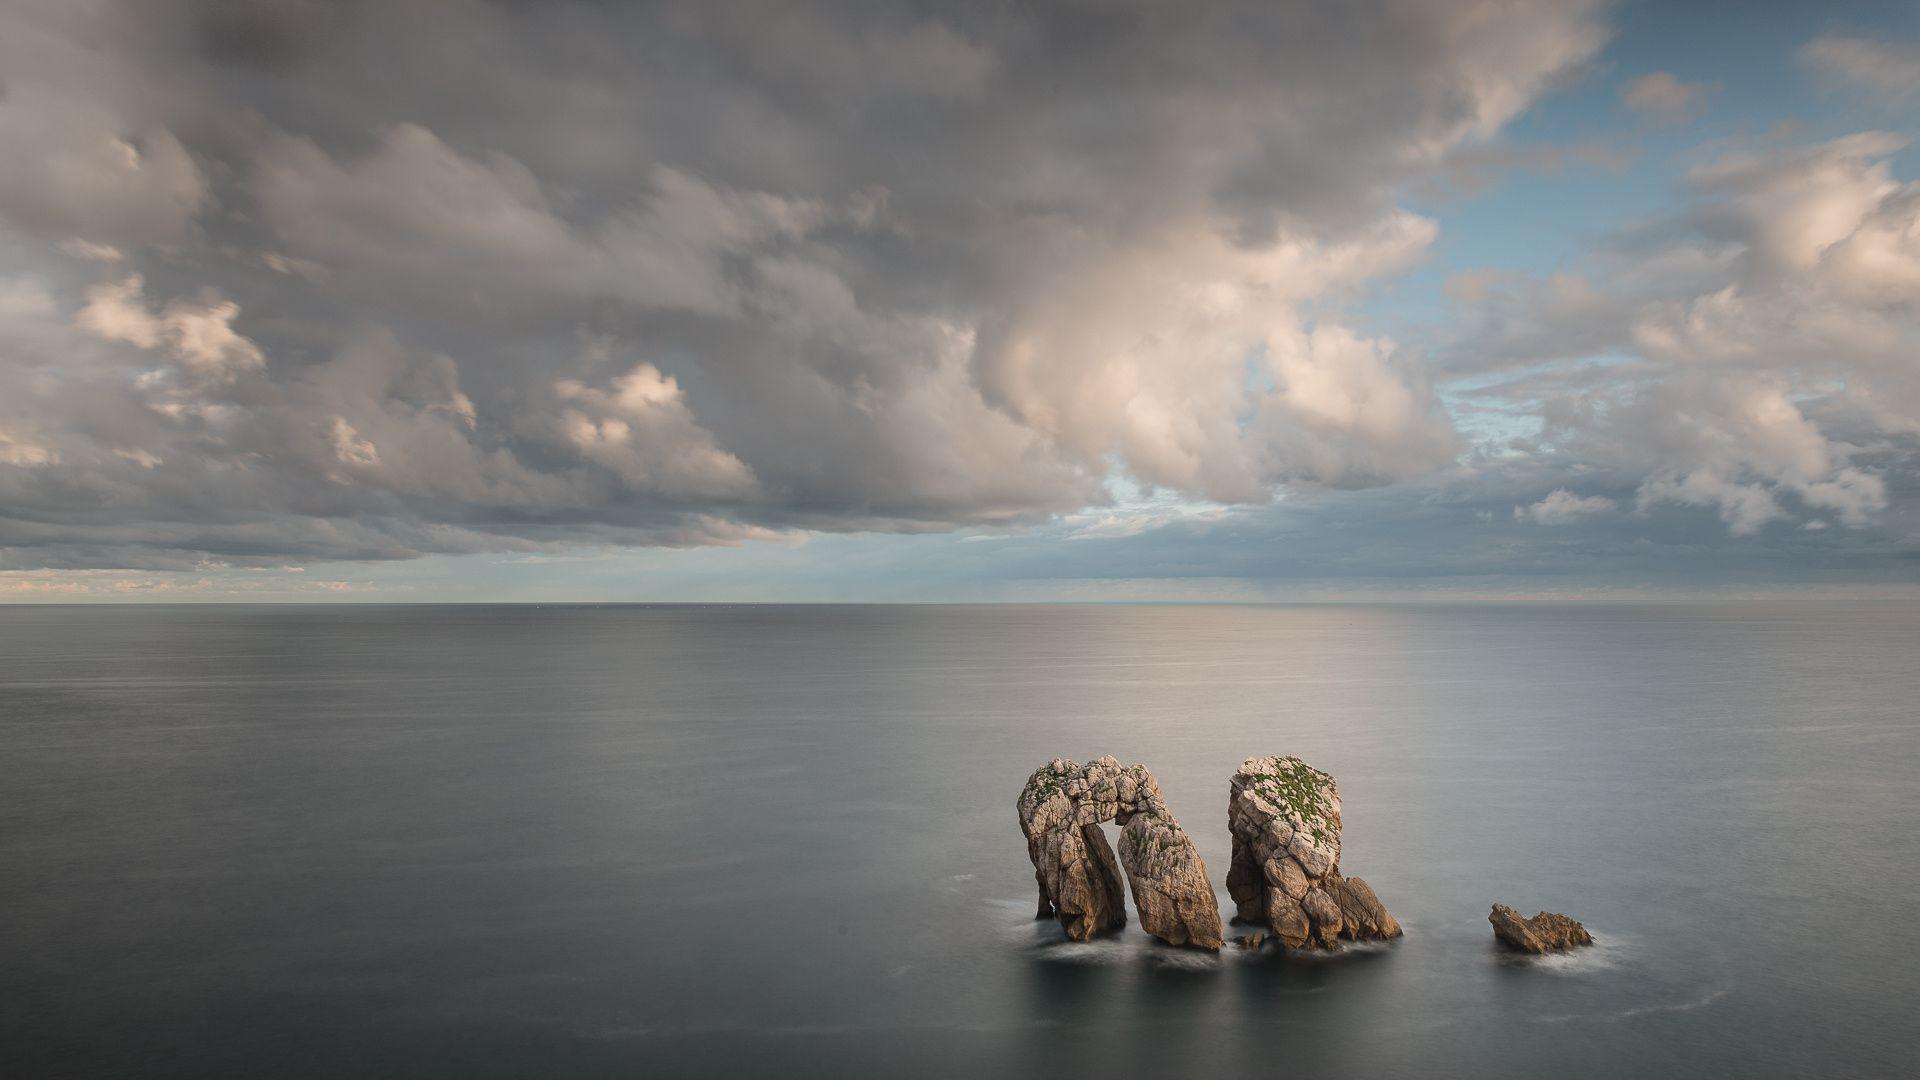 Rocks ~ Spain by Jesús Ignacio Bravo Soler on 500px